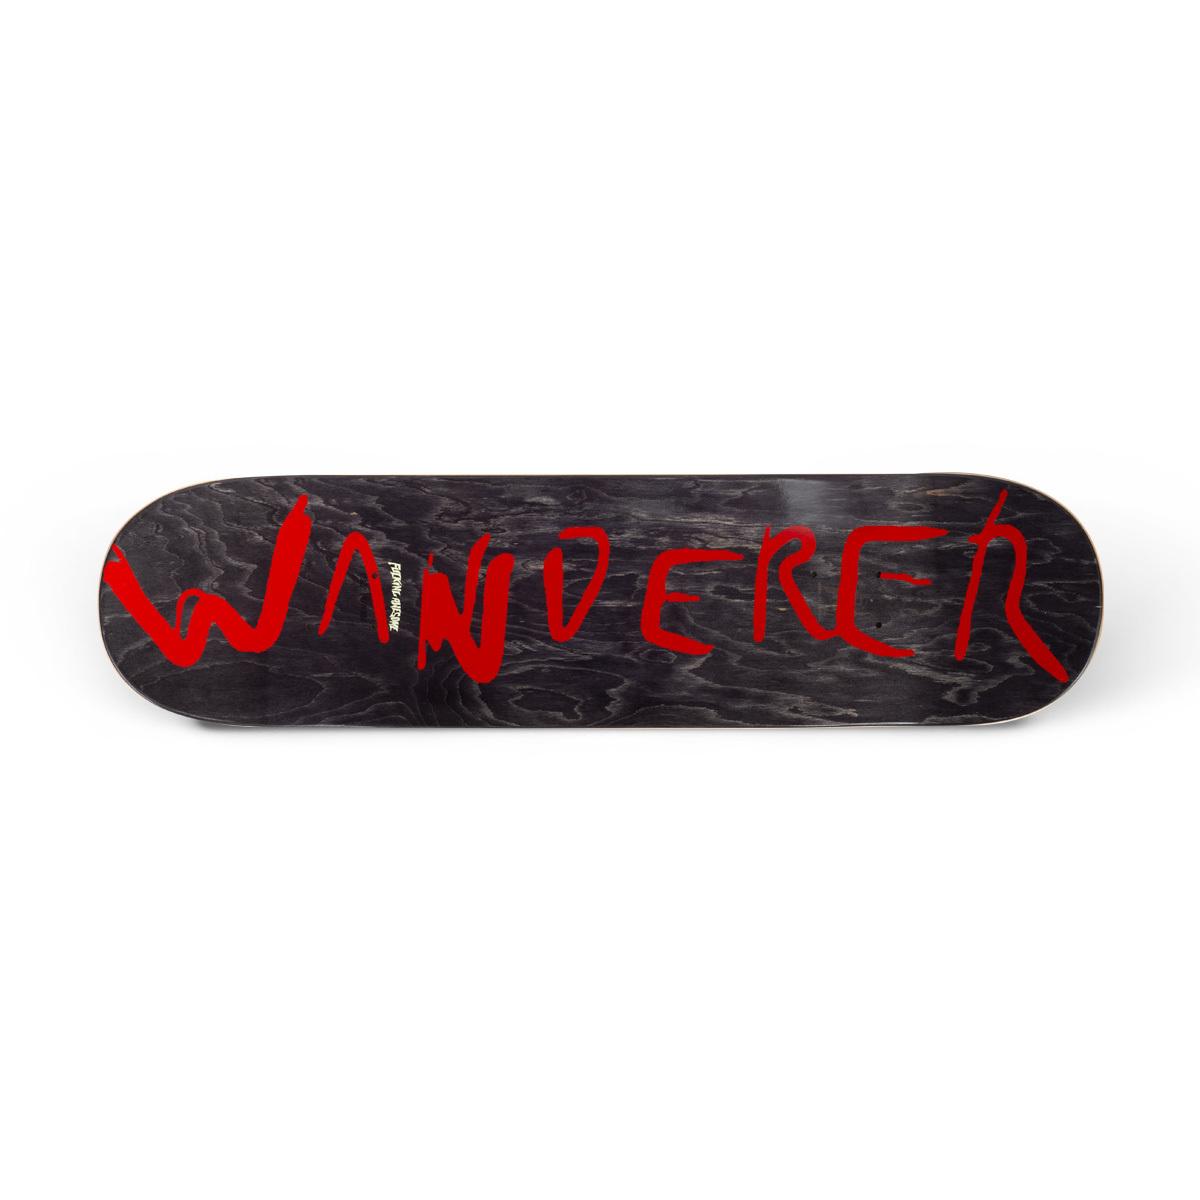 Wanderer Skateboard Deck